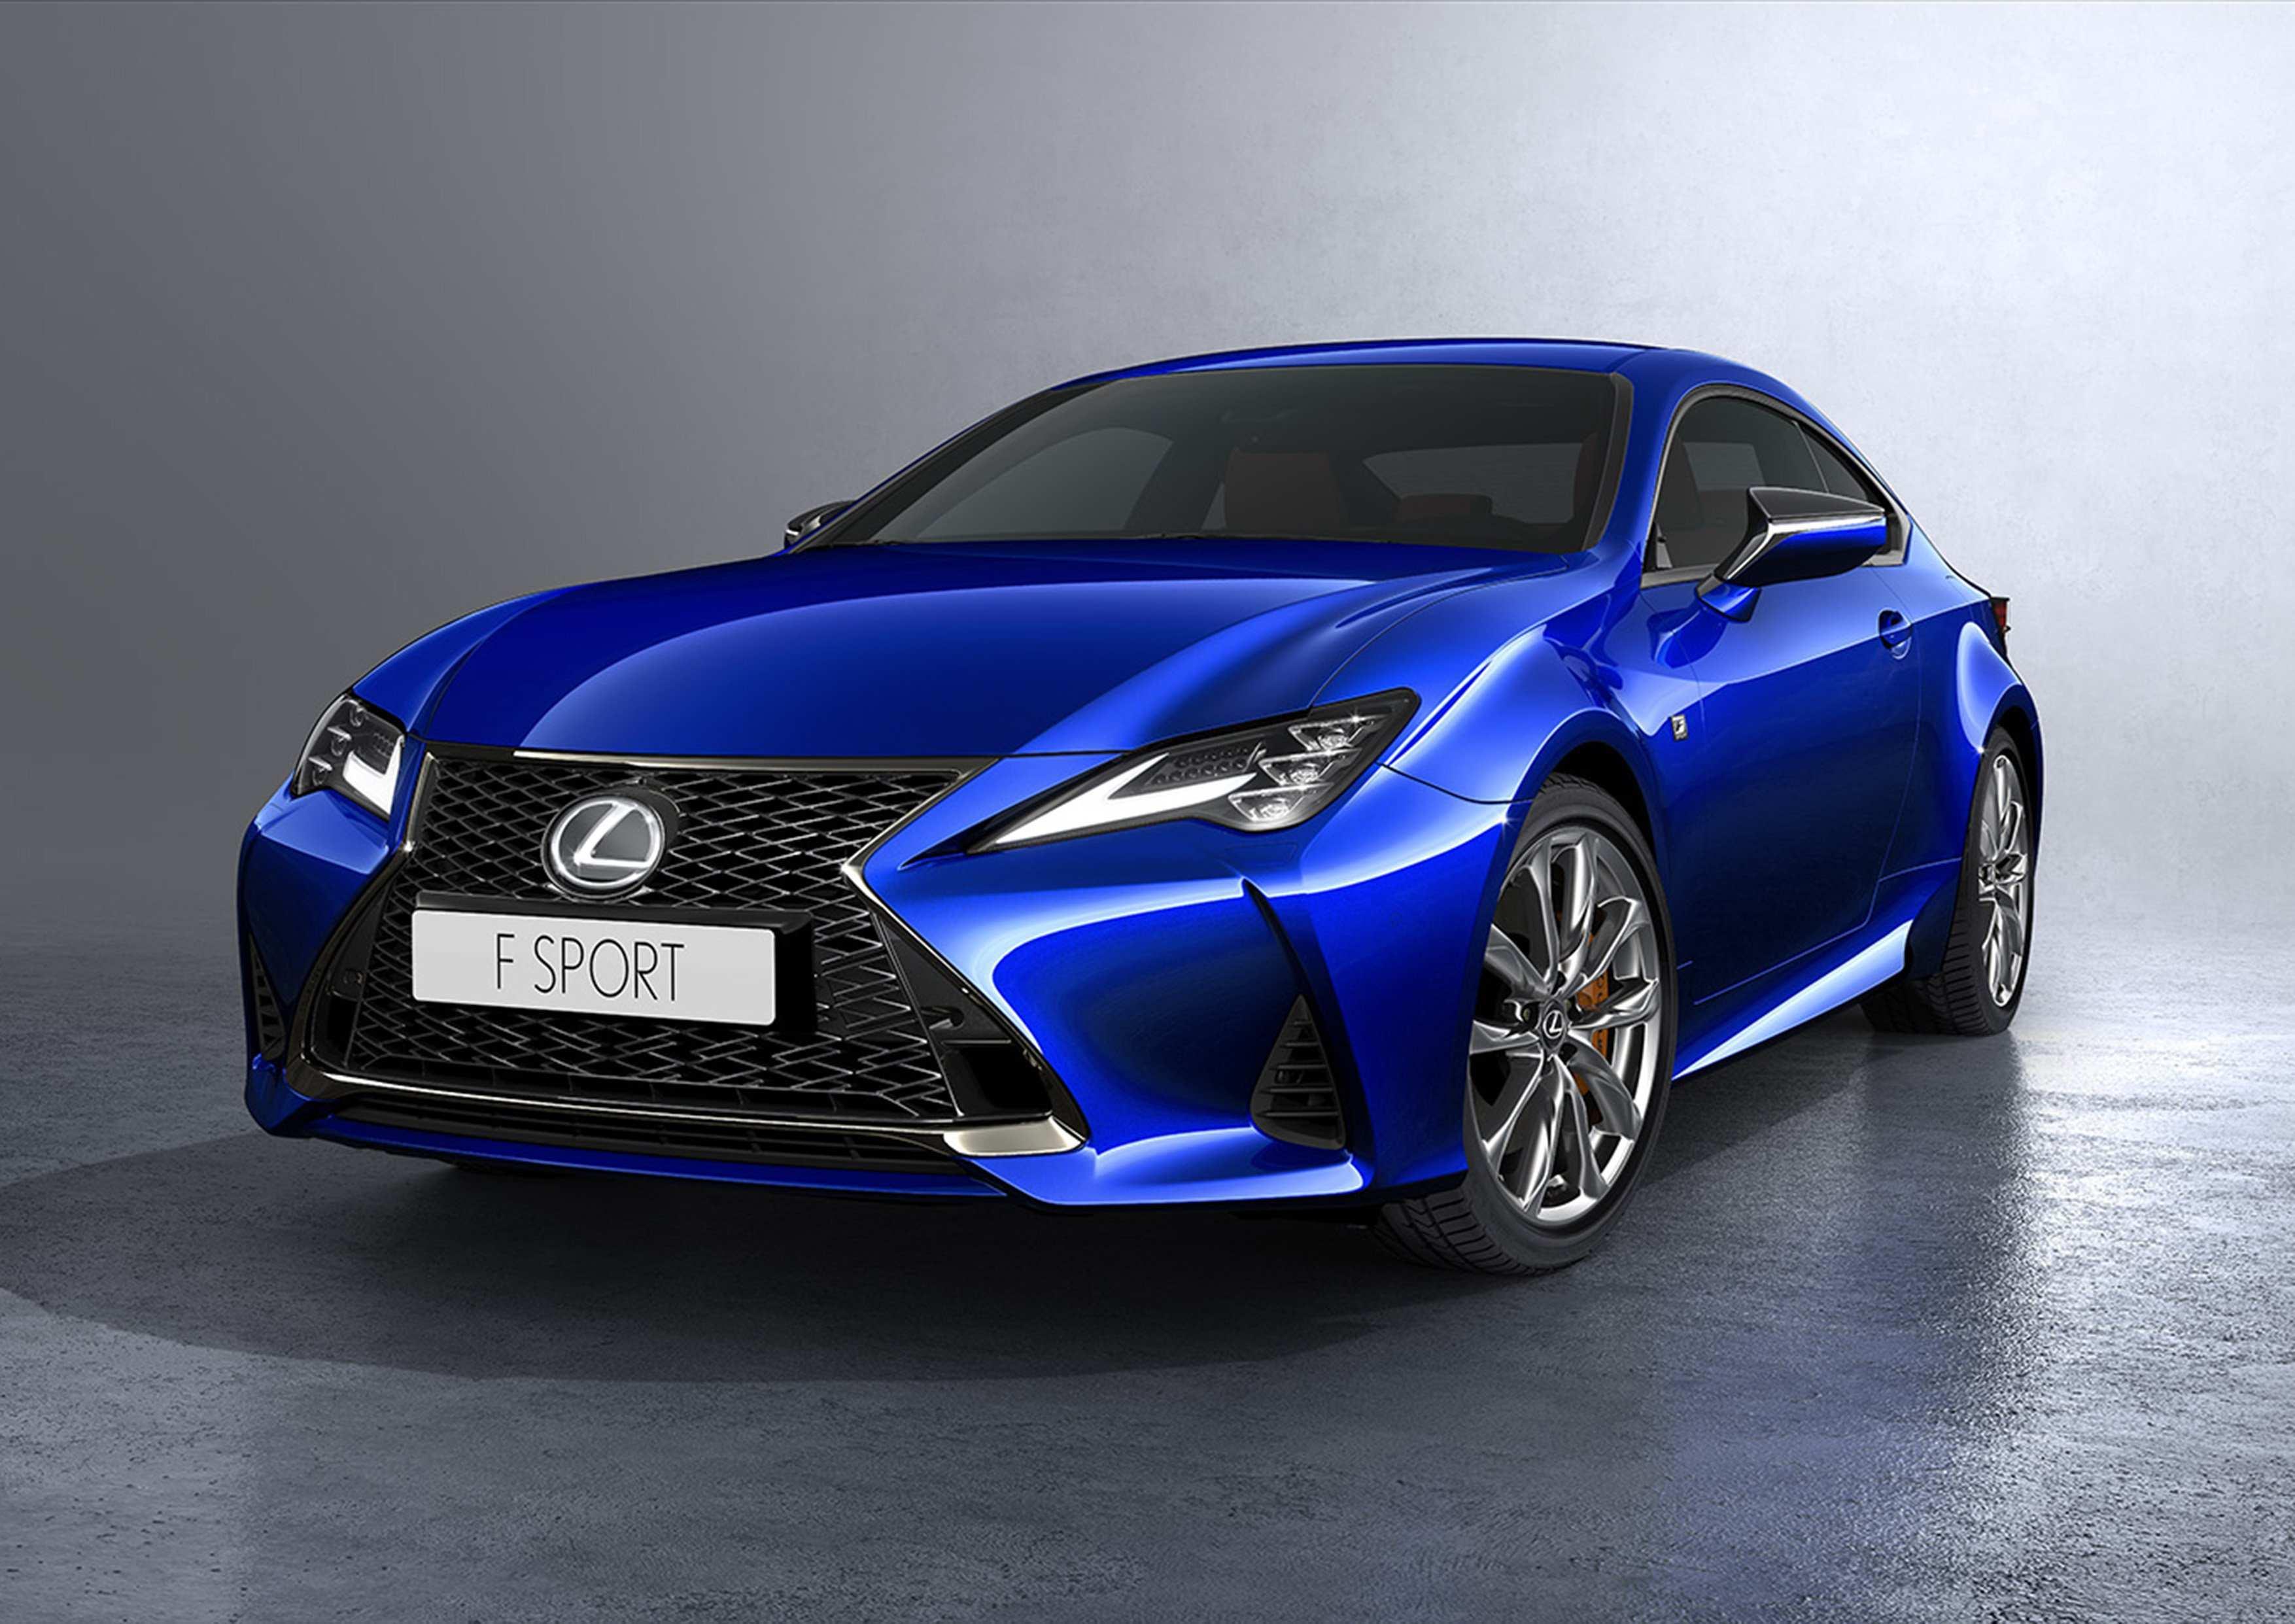 36 Best Review Lexus 2020 Sport Spesification with Lexus 2020 Sport